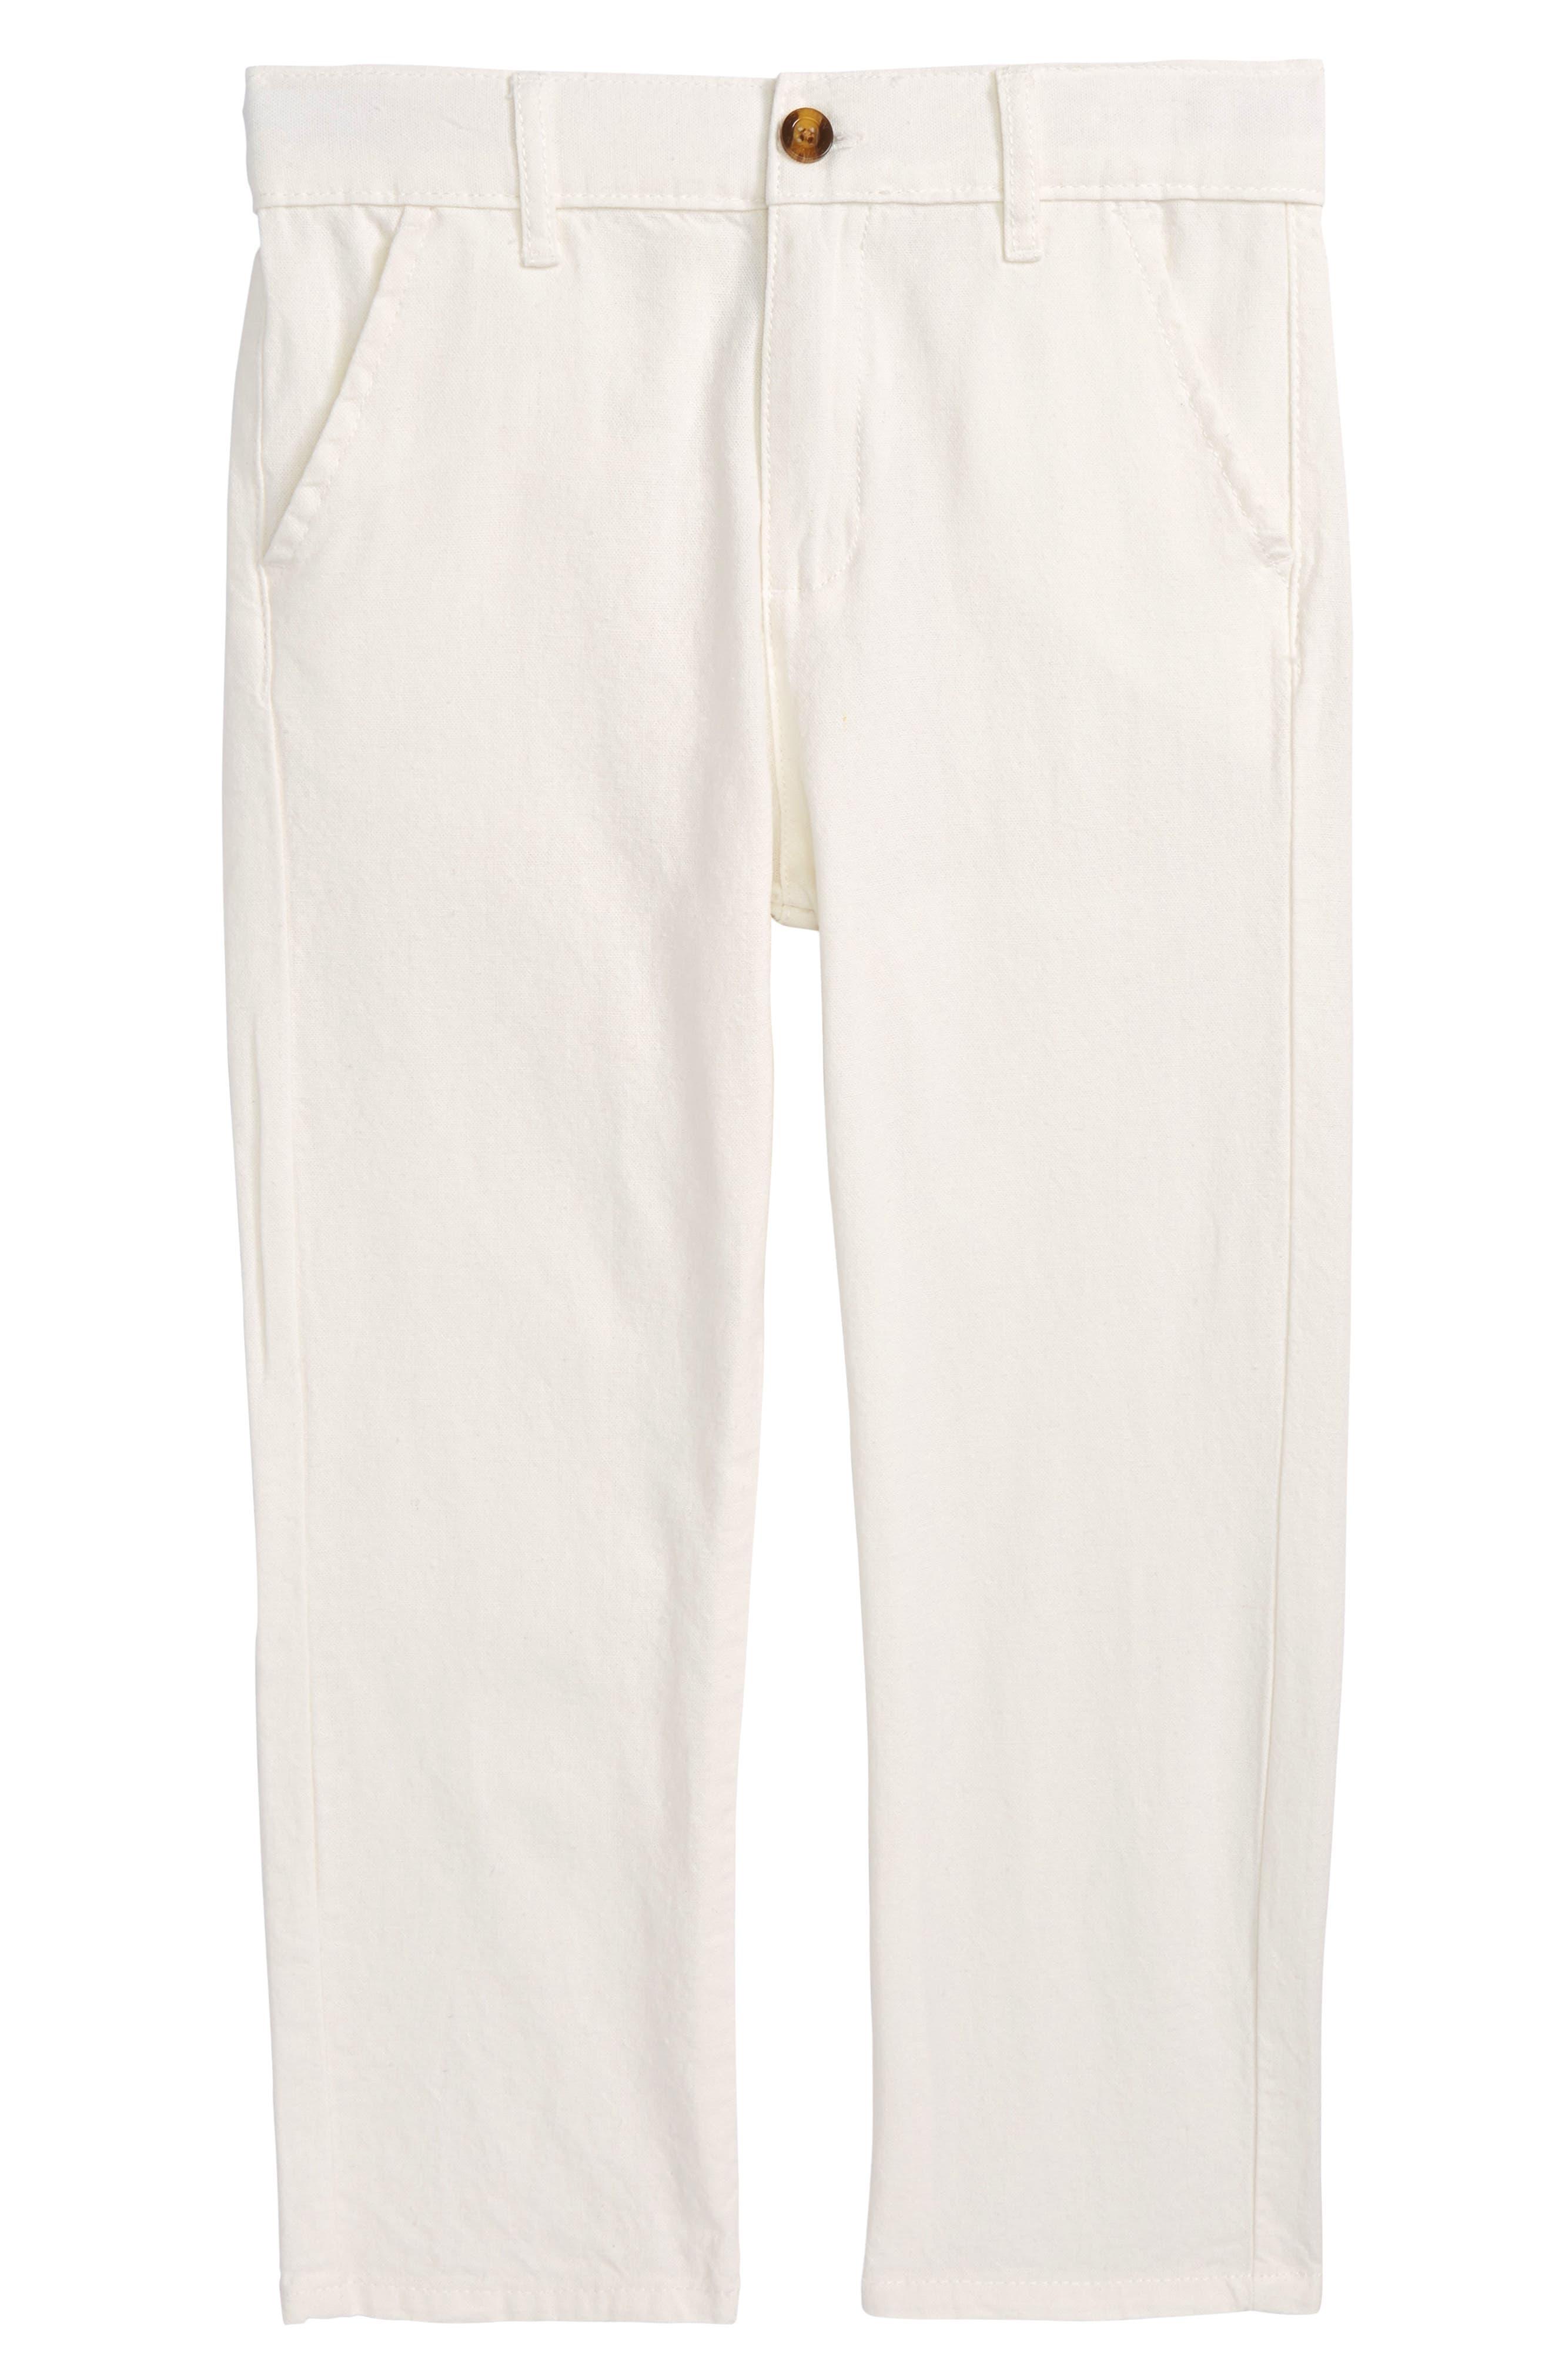 Beach Pants,                             Main thumbnail 1, color,                             Ivory